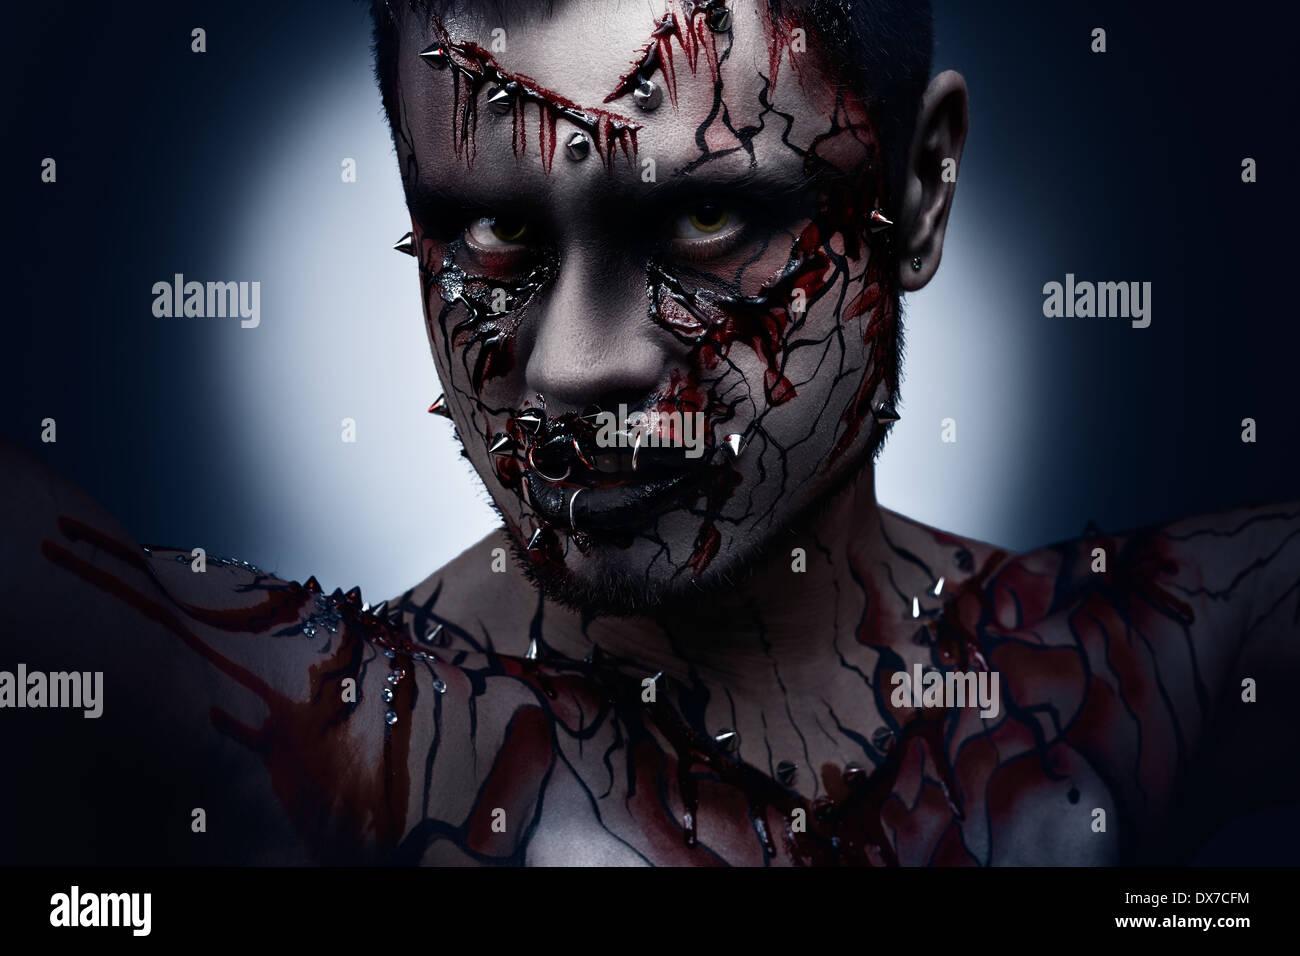 Un concept d'un halloween effrayant Dark Moor en colère avec un peircing et sanglante l'art corporel. Photo Stock